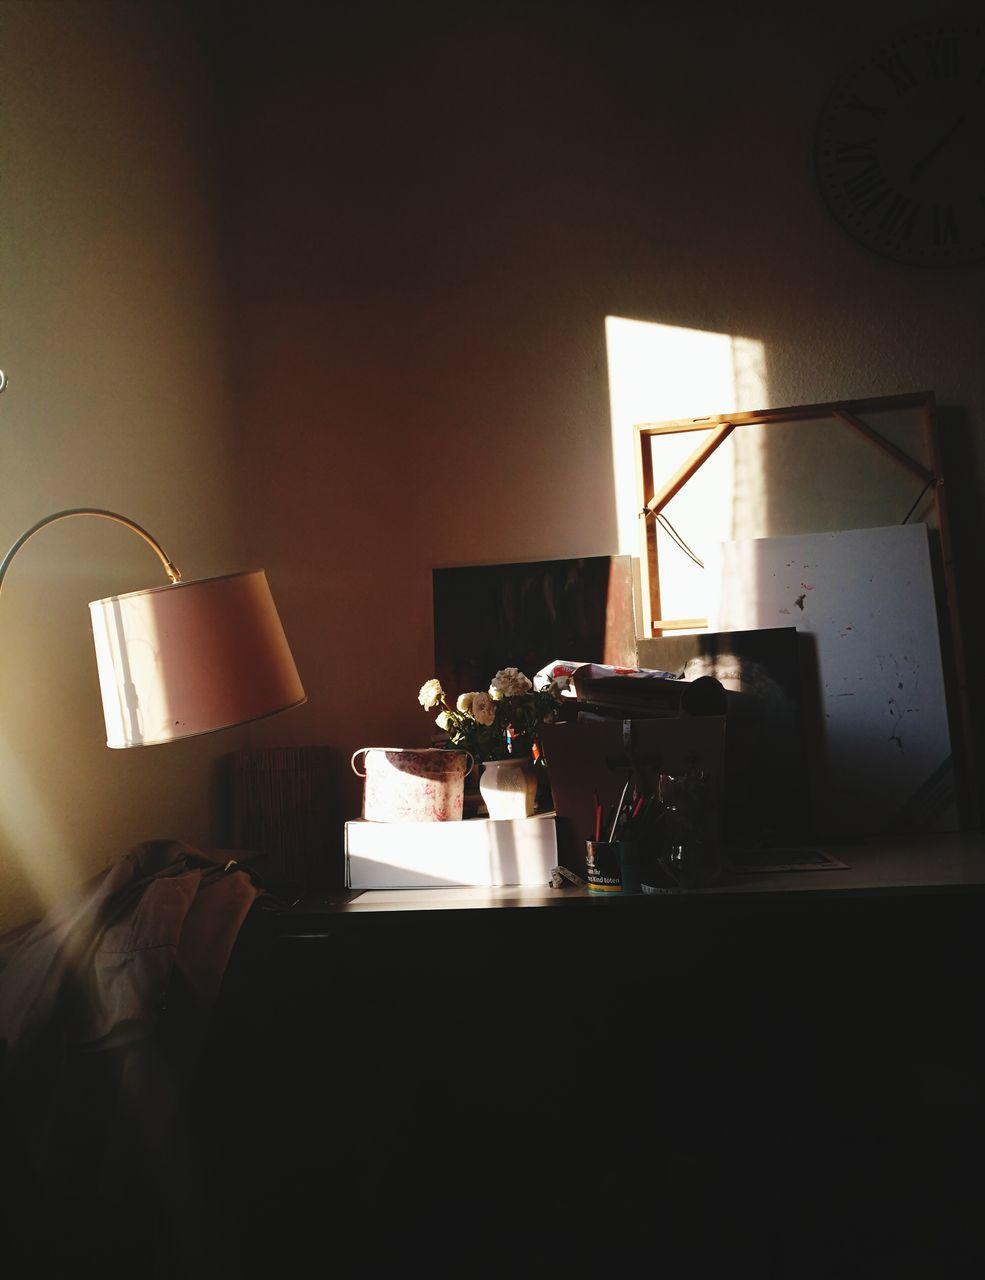 indoors, table, home interior, no people, lamp shade, illuminated, home showcase interior, day